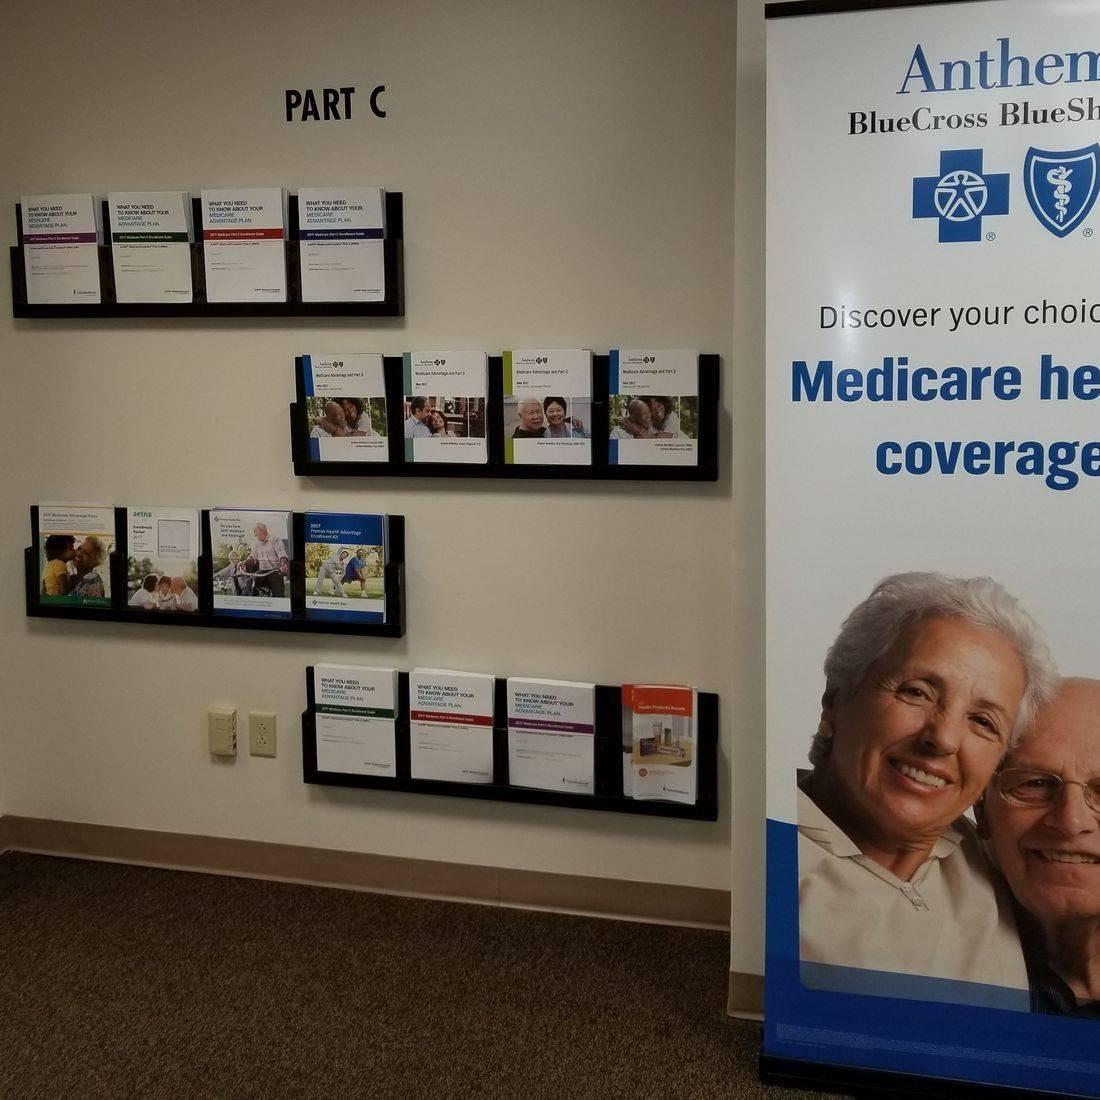 Anthem Medicare store